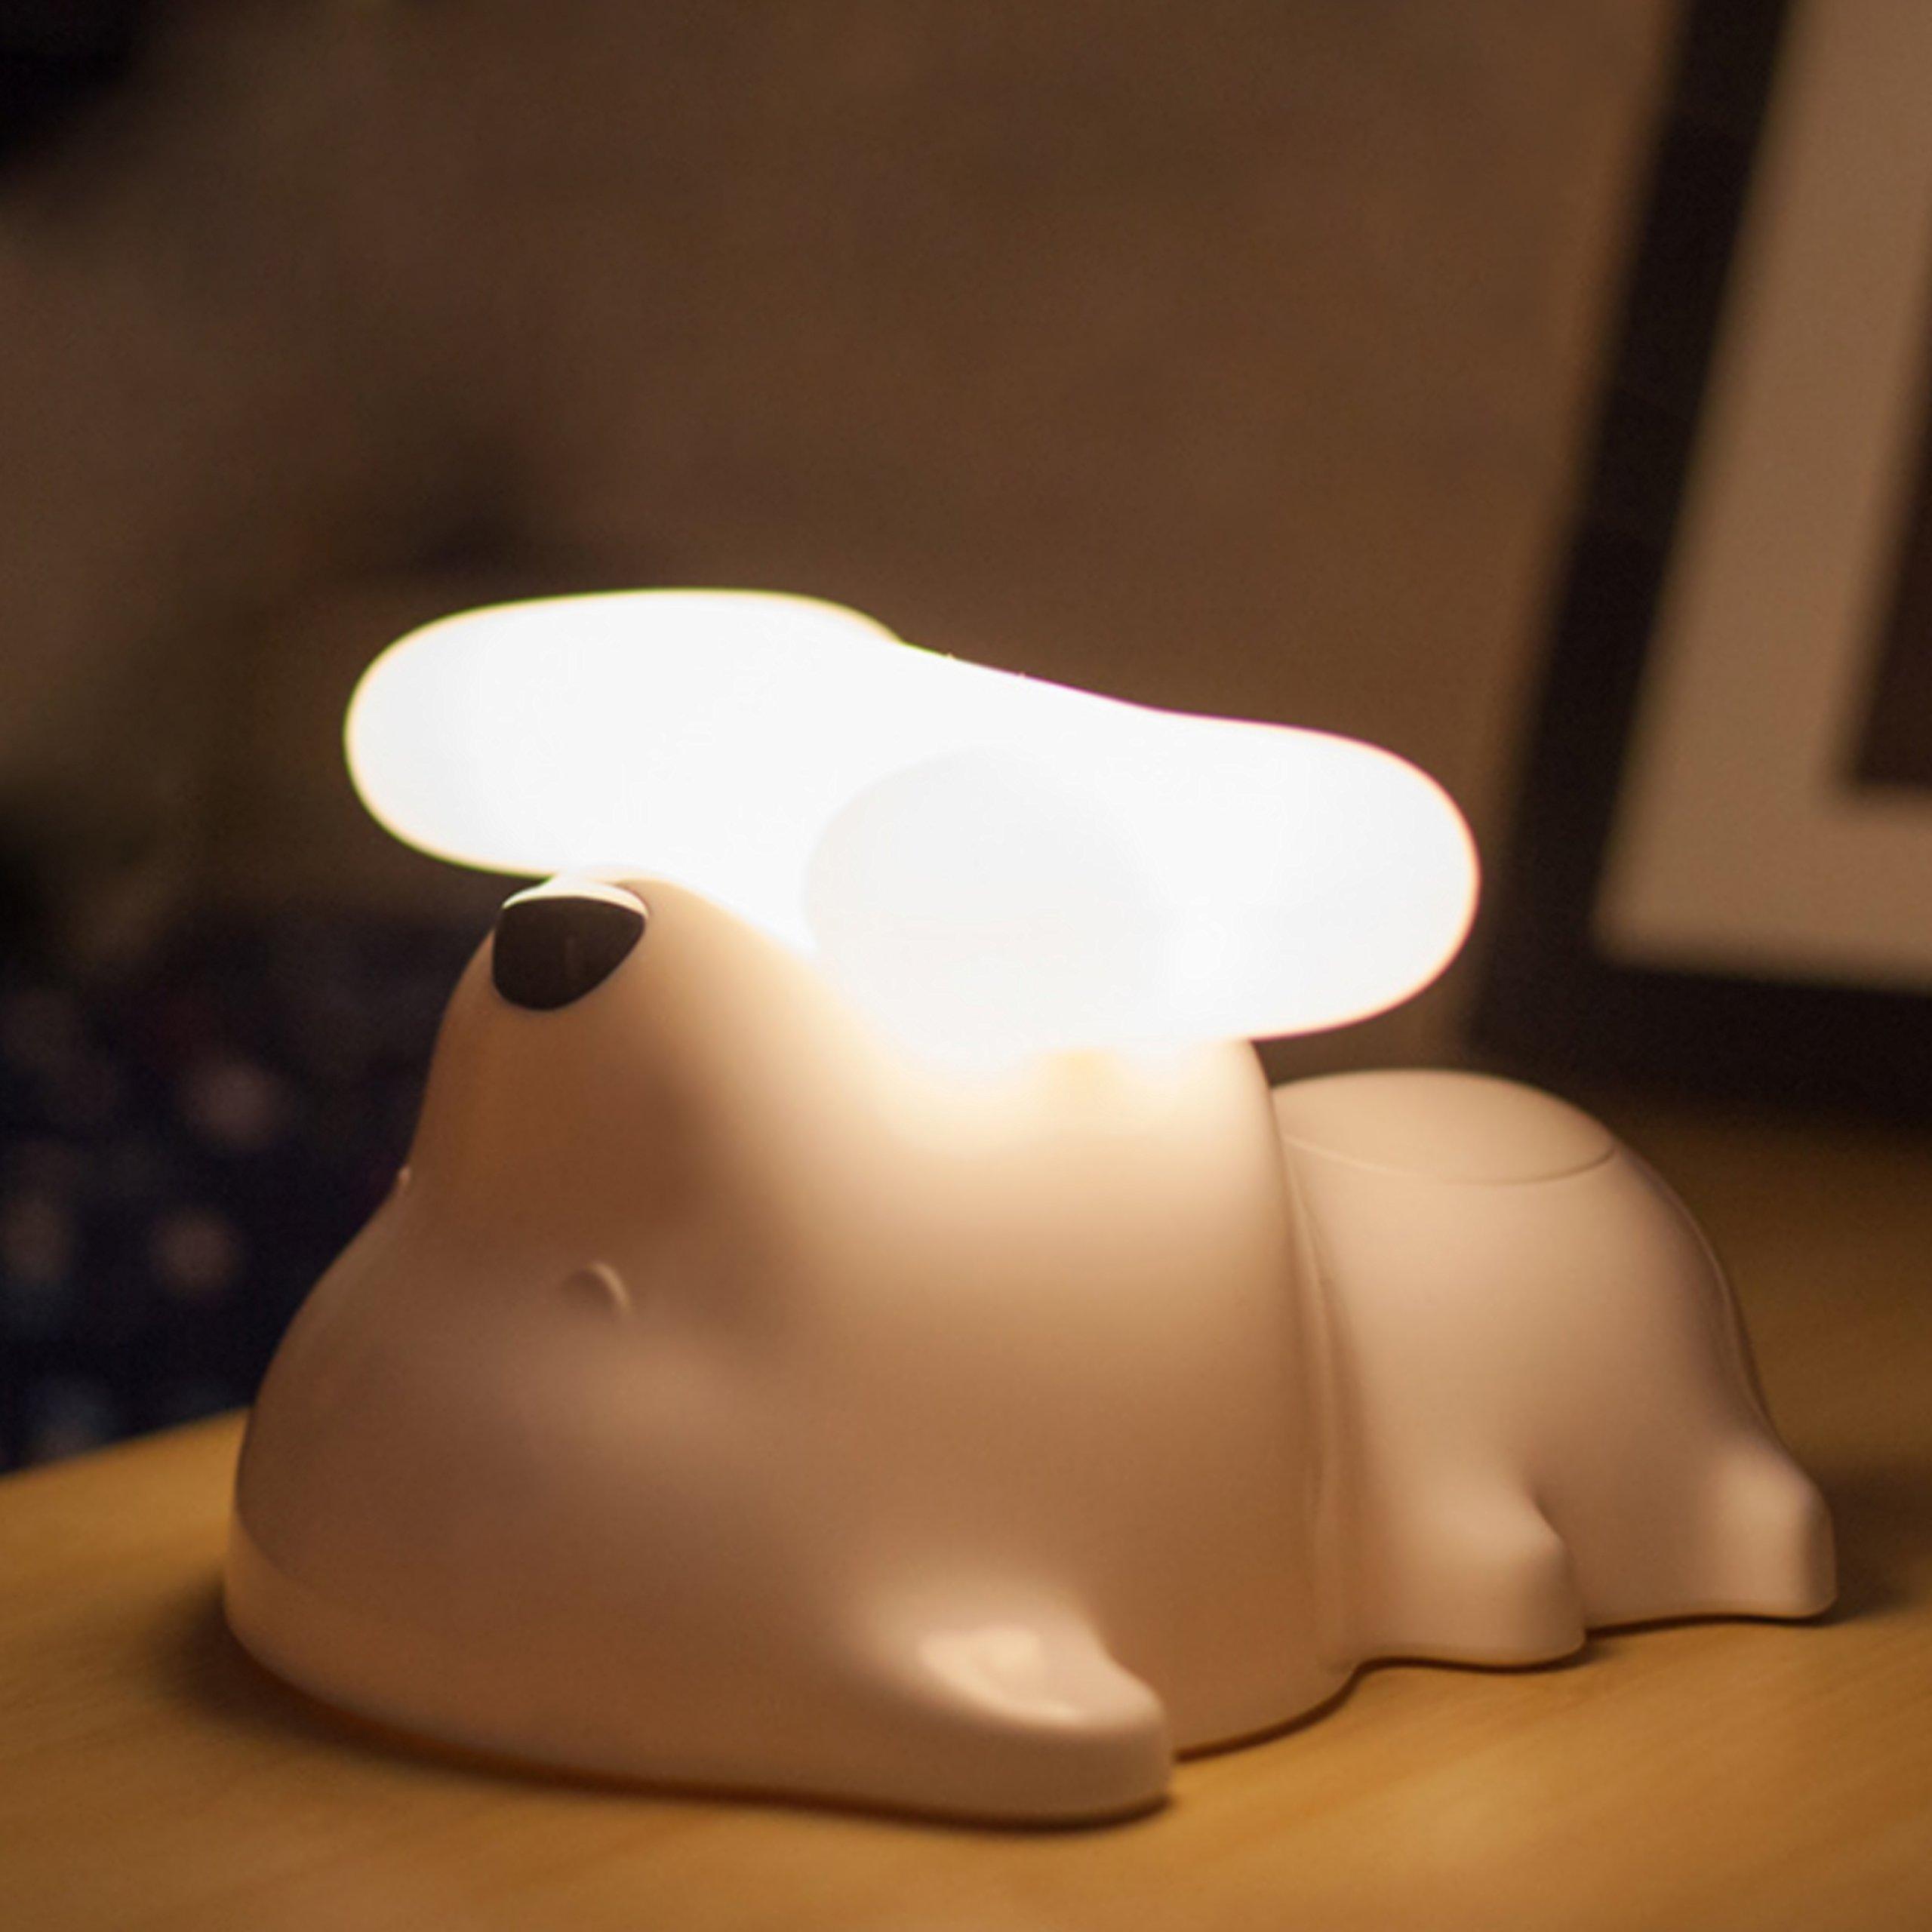 Dog Shaped Night Light, Cordless Bedside Touch Sensor LED Puppy Lamp, White